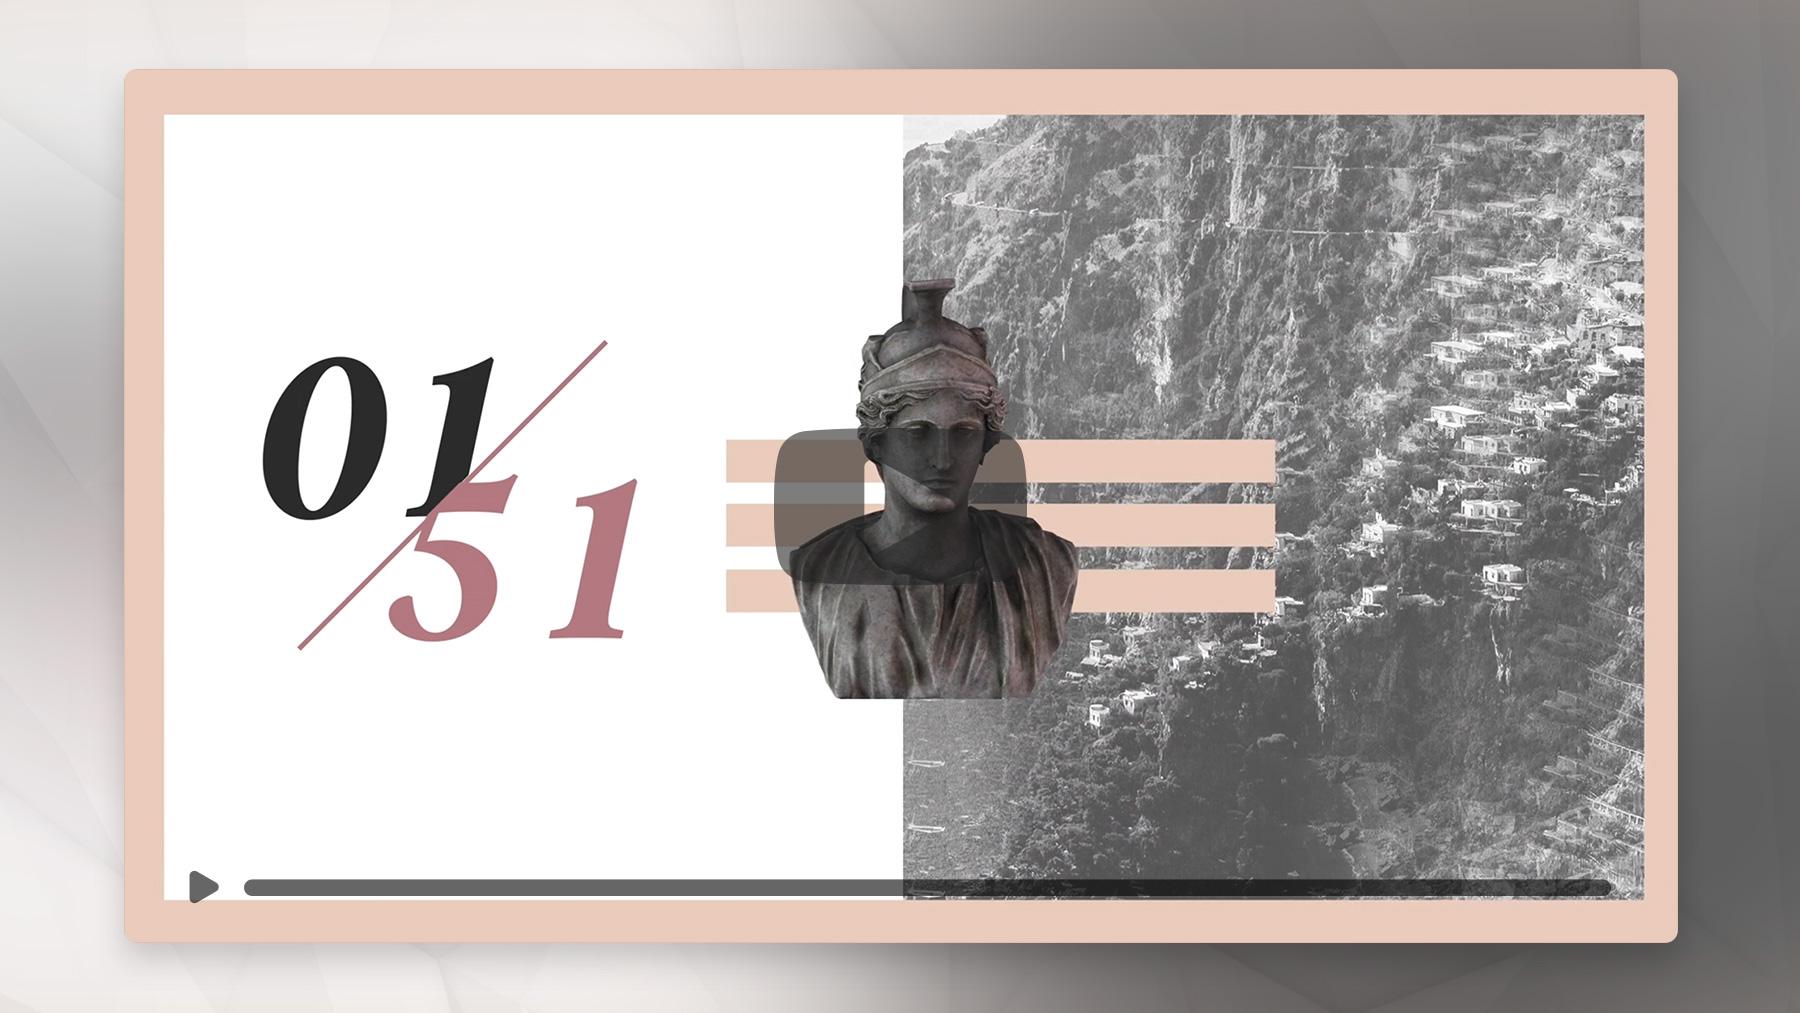 iagm countdown video